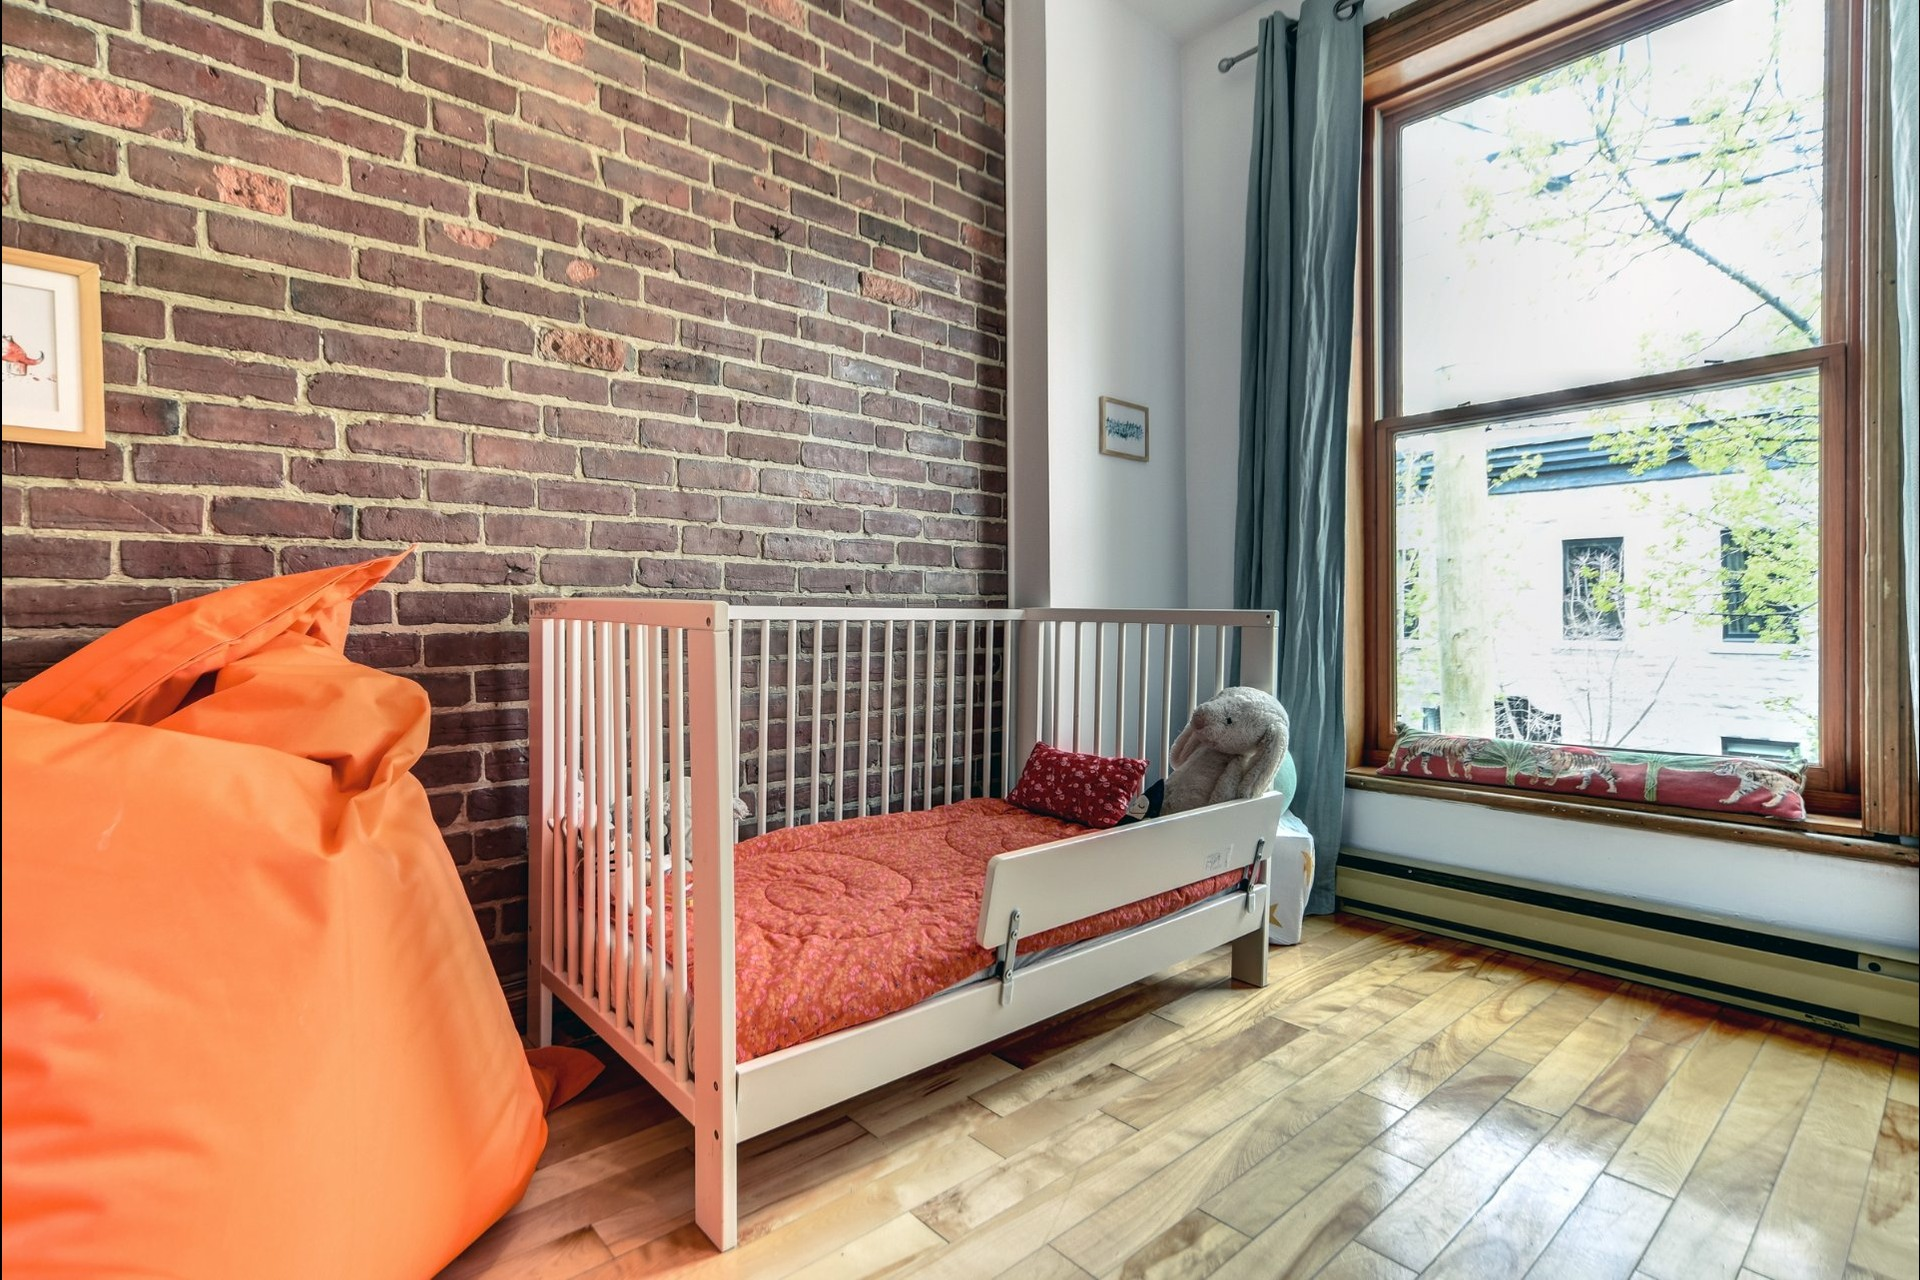 image 16 - Departamento En venta Le Plateau-Mont-Royal Montréal  - 6 habitaciones